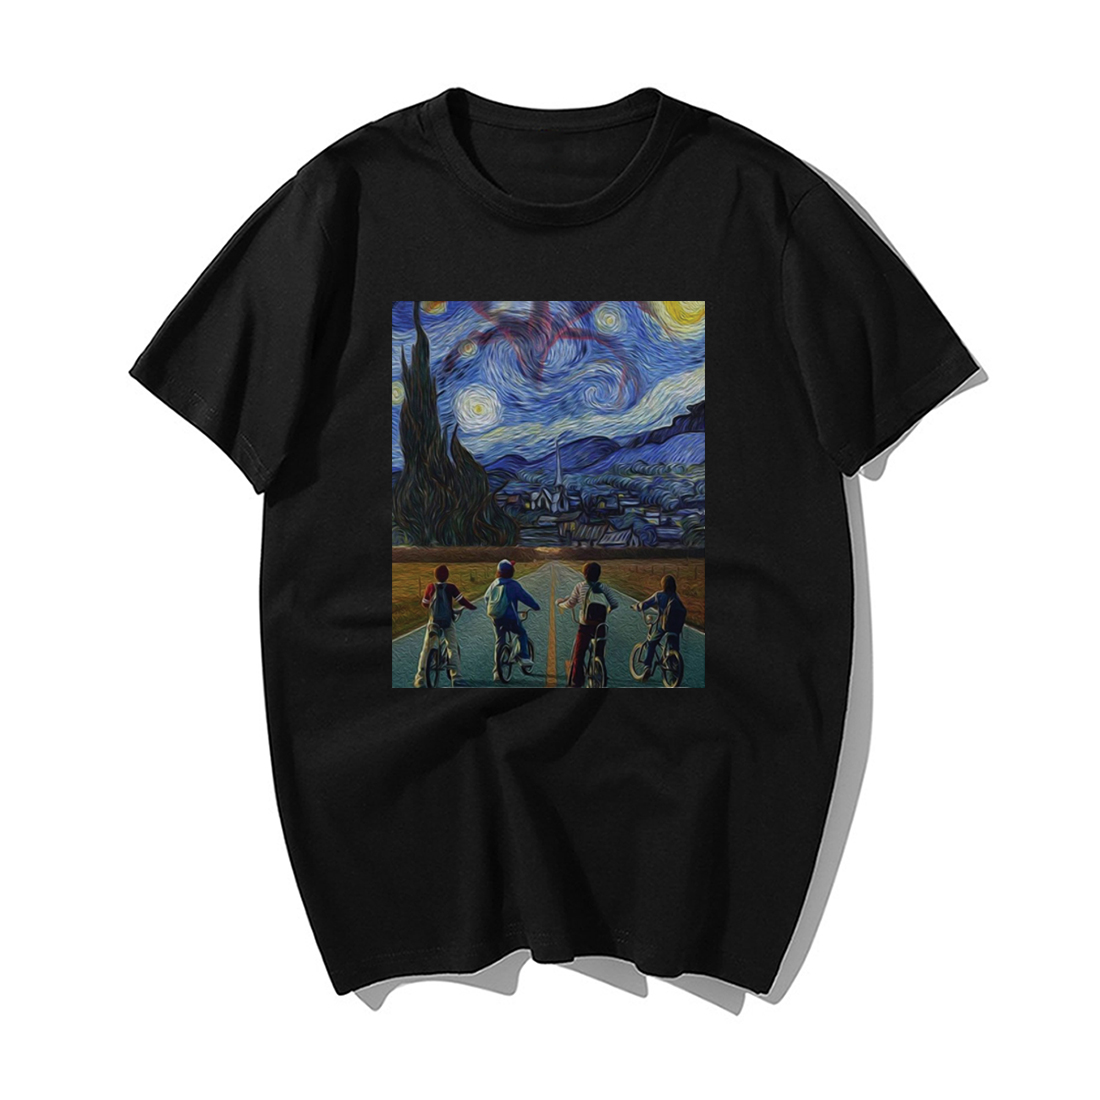 Funny Stranger Things T Shirt Men Fashion Tv Show Tshirt Mens Starry Night Demogorgon Eleven Steve Cotton Hip Hop Tops T Shirt